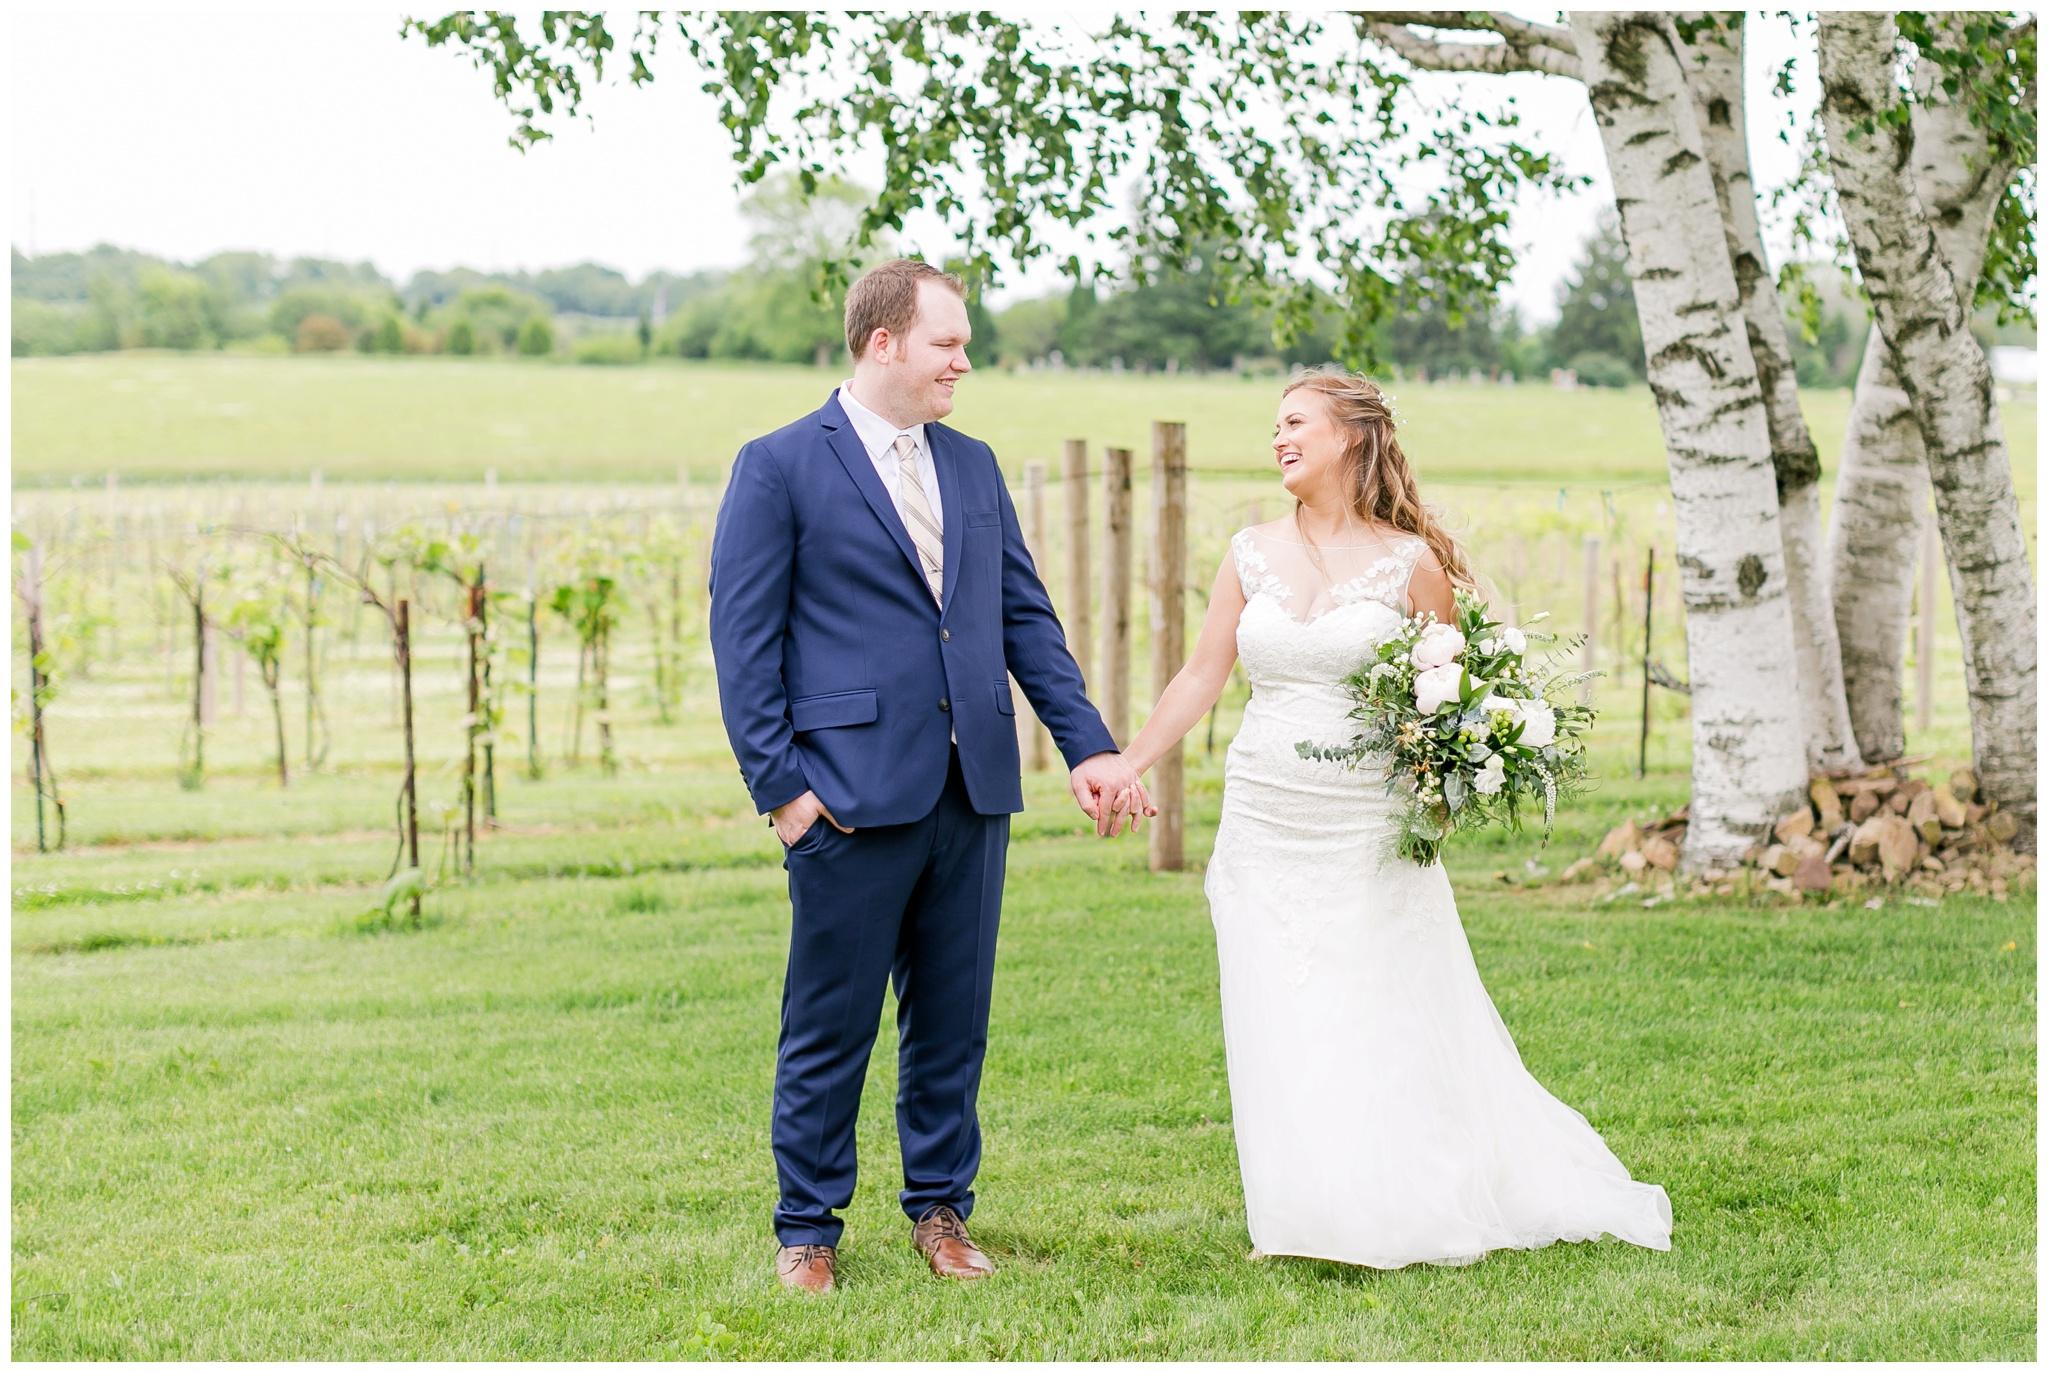 over_the_vines_wedding_edgerton_wisconsin_wedding_caynay_photo_3990.jpg